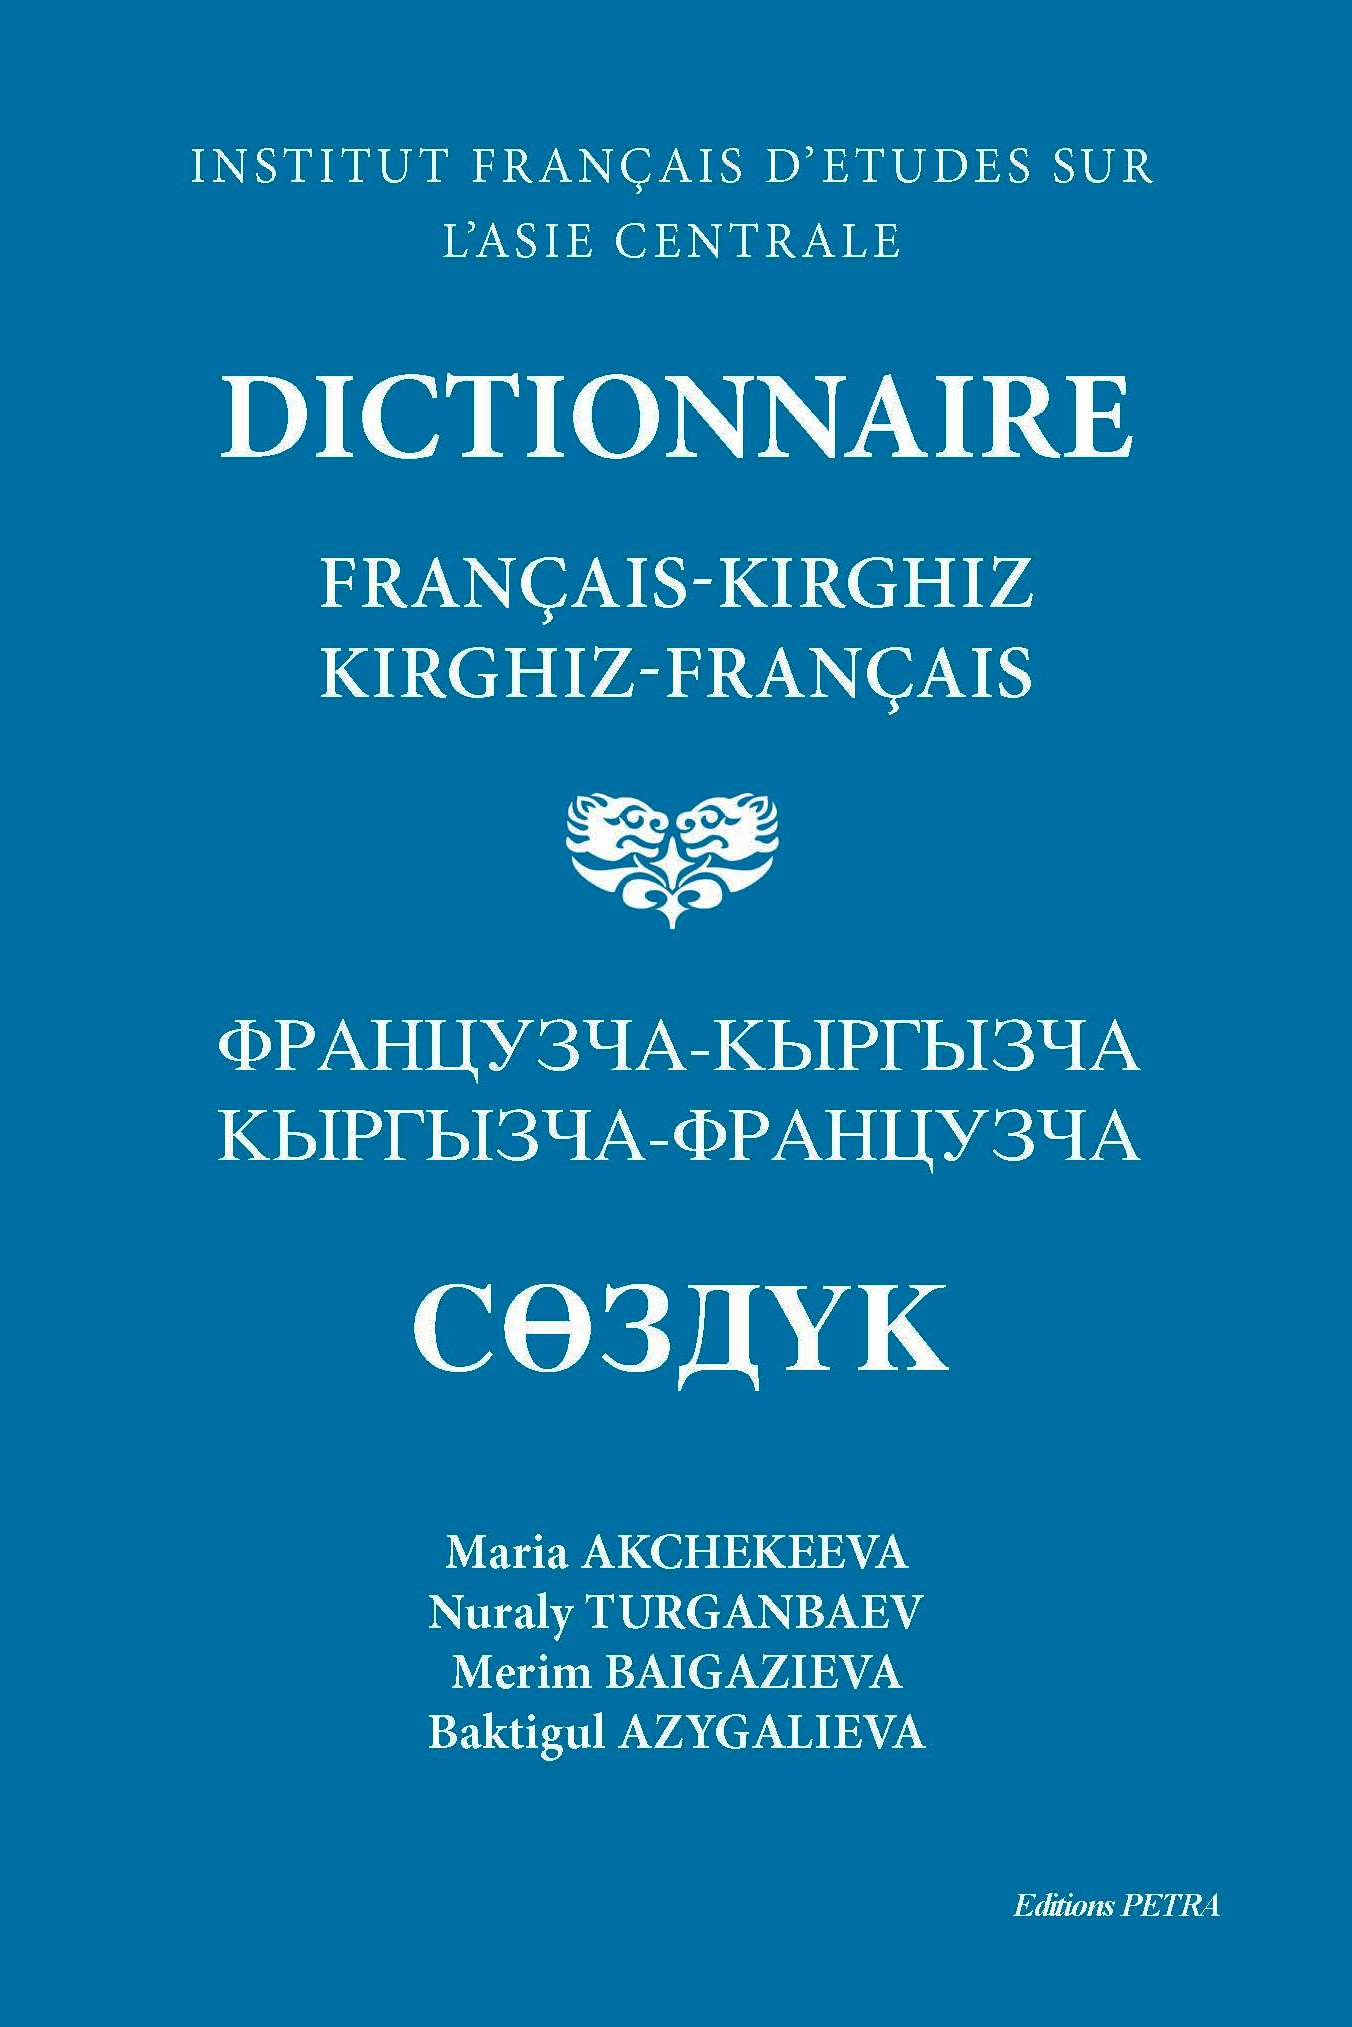 Dictionnaire fran ais kirghiz kirghiz fran ais de nuraly turganbaev maria akchekeeva merim - Bureau d etude traduction ...